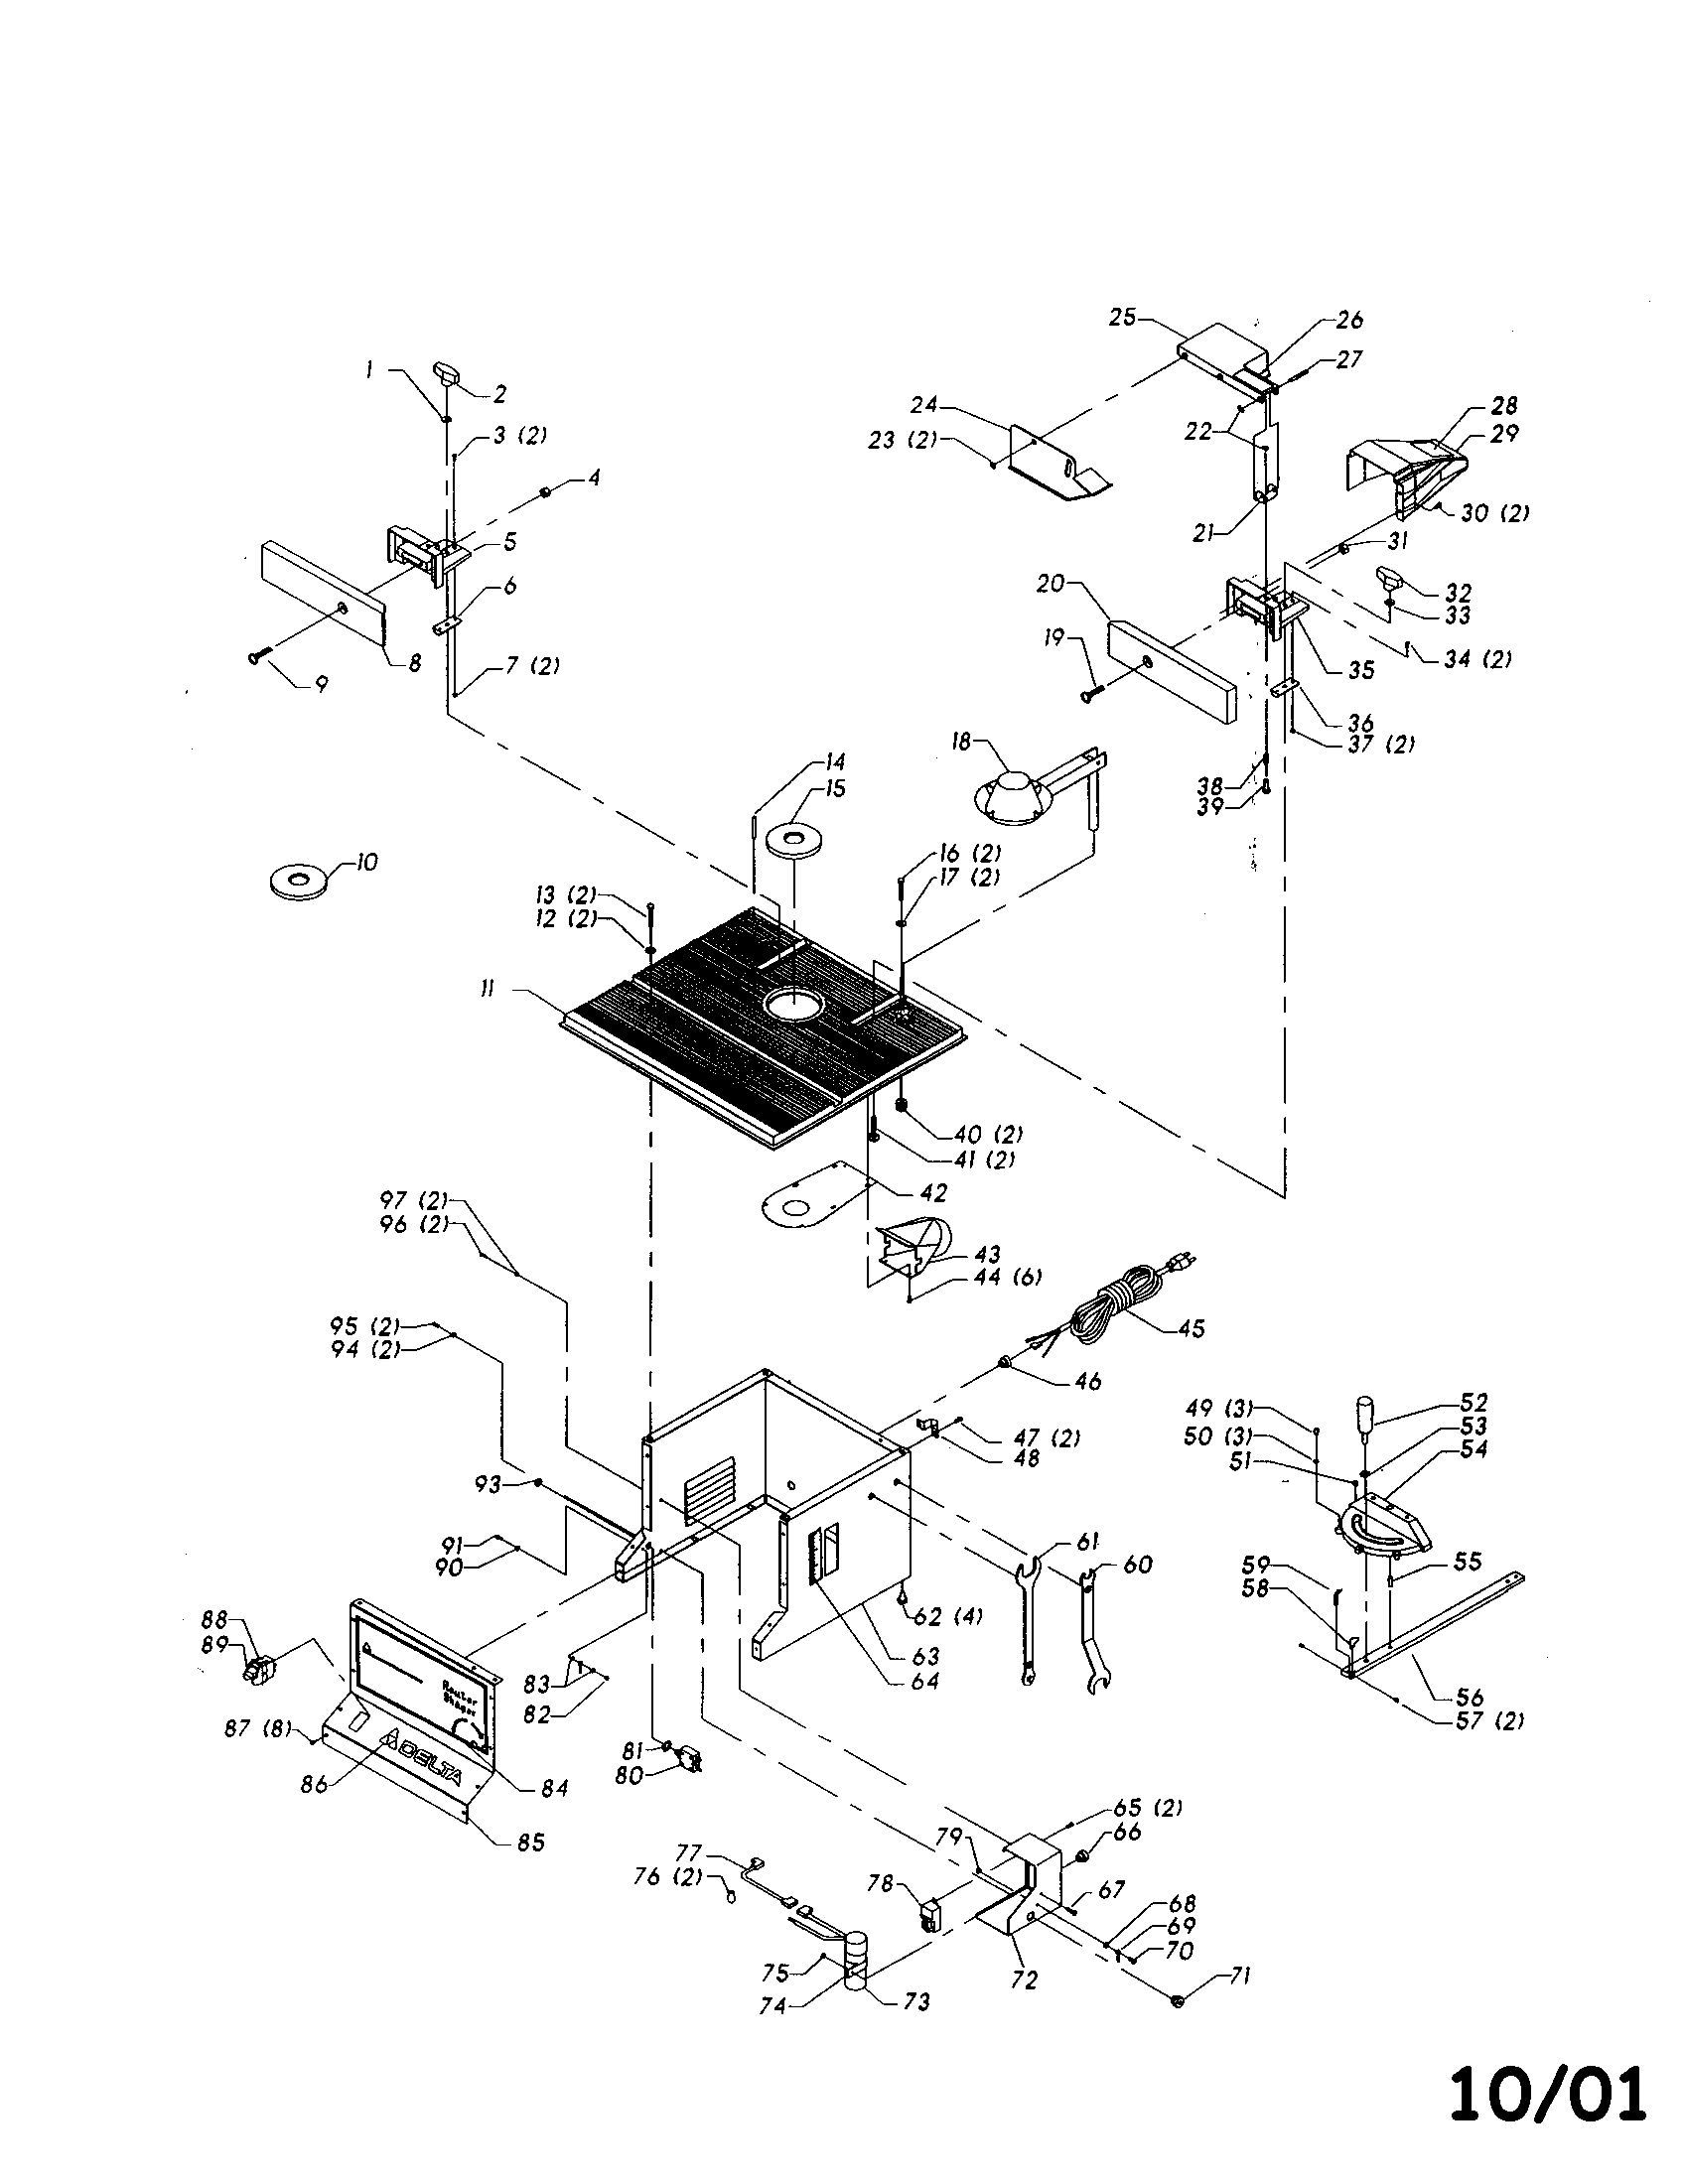 Delta model 43-505 router genuine parts